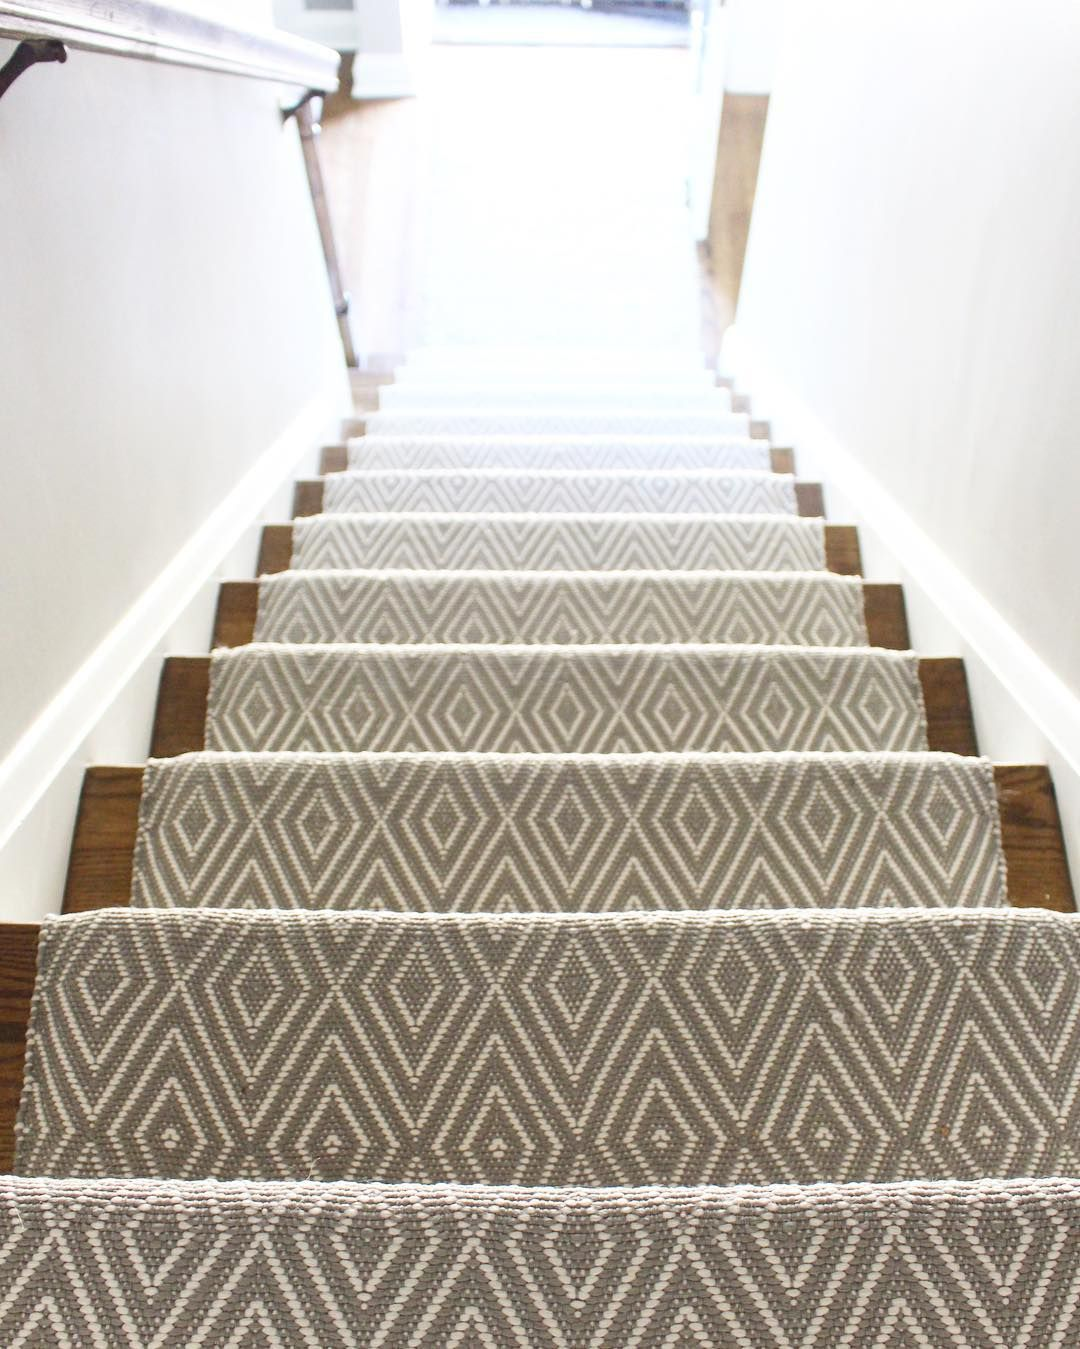 Wide Stair Runner W Pattern Carpet Stairs Stair Runner Carpet